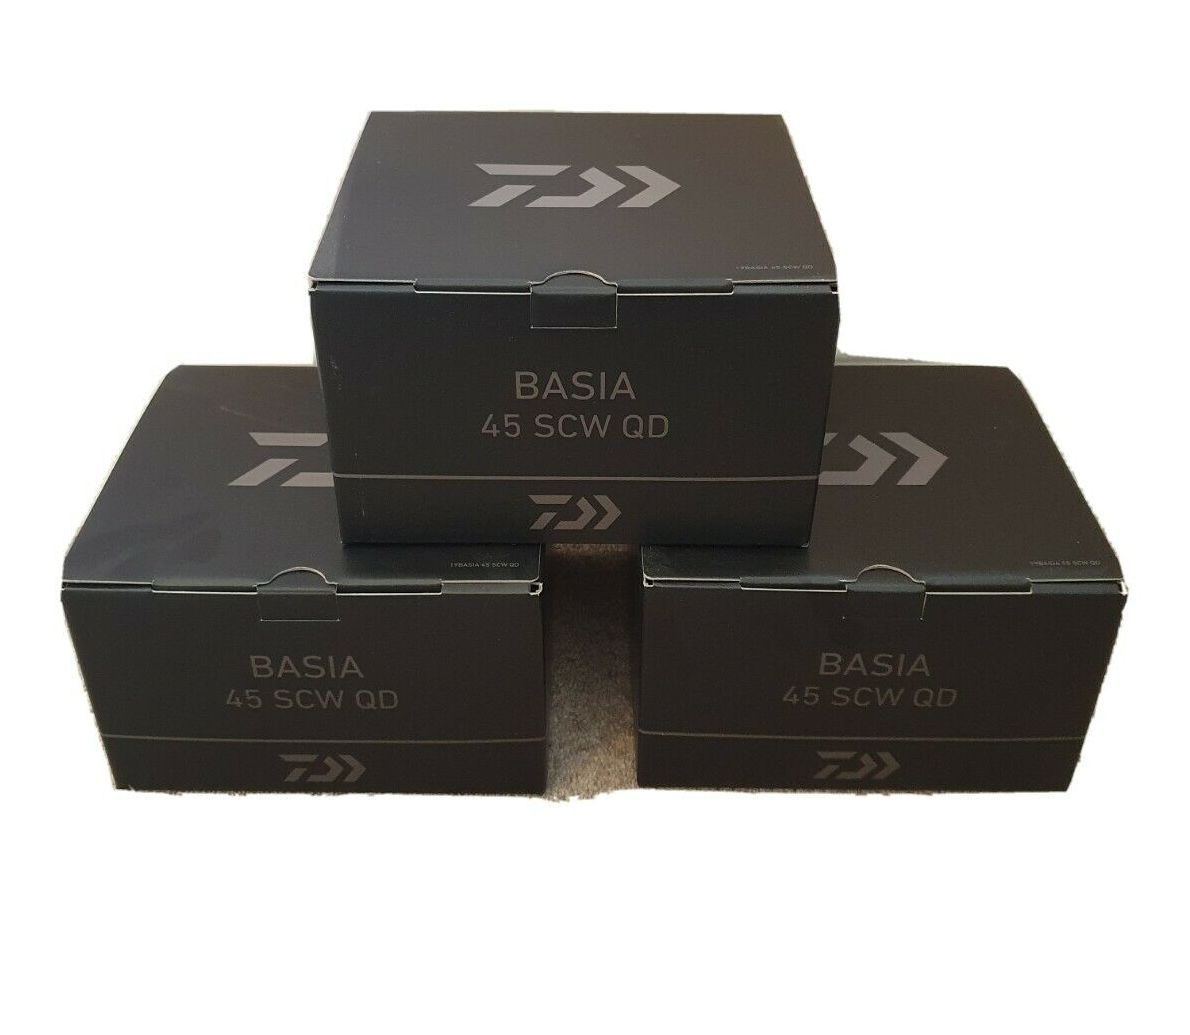 Ad - Daiwa Basia 45 SCW QD (SET OF THREE) On eBay here -->> https://t.co/FCVkxzasLF  #carpfish